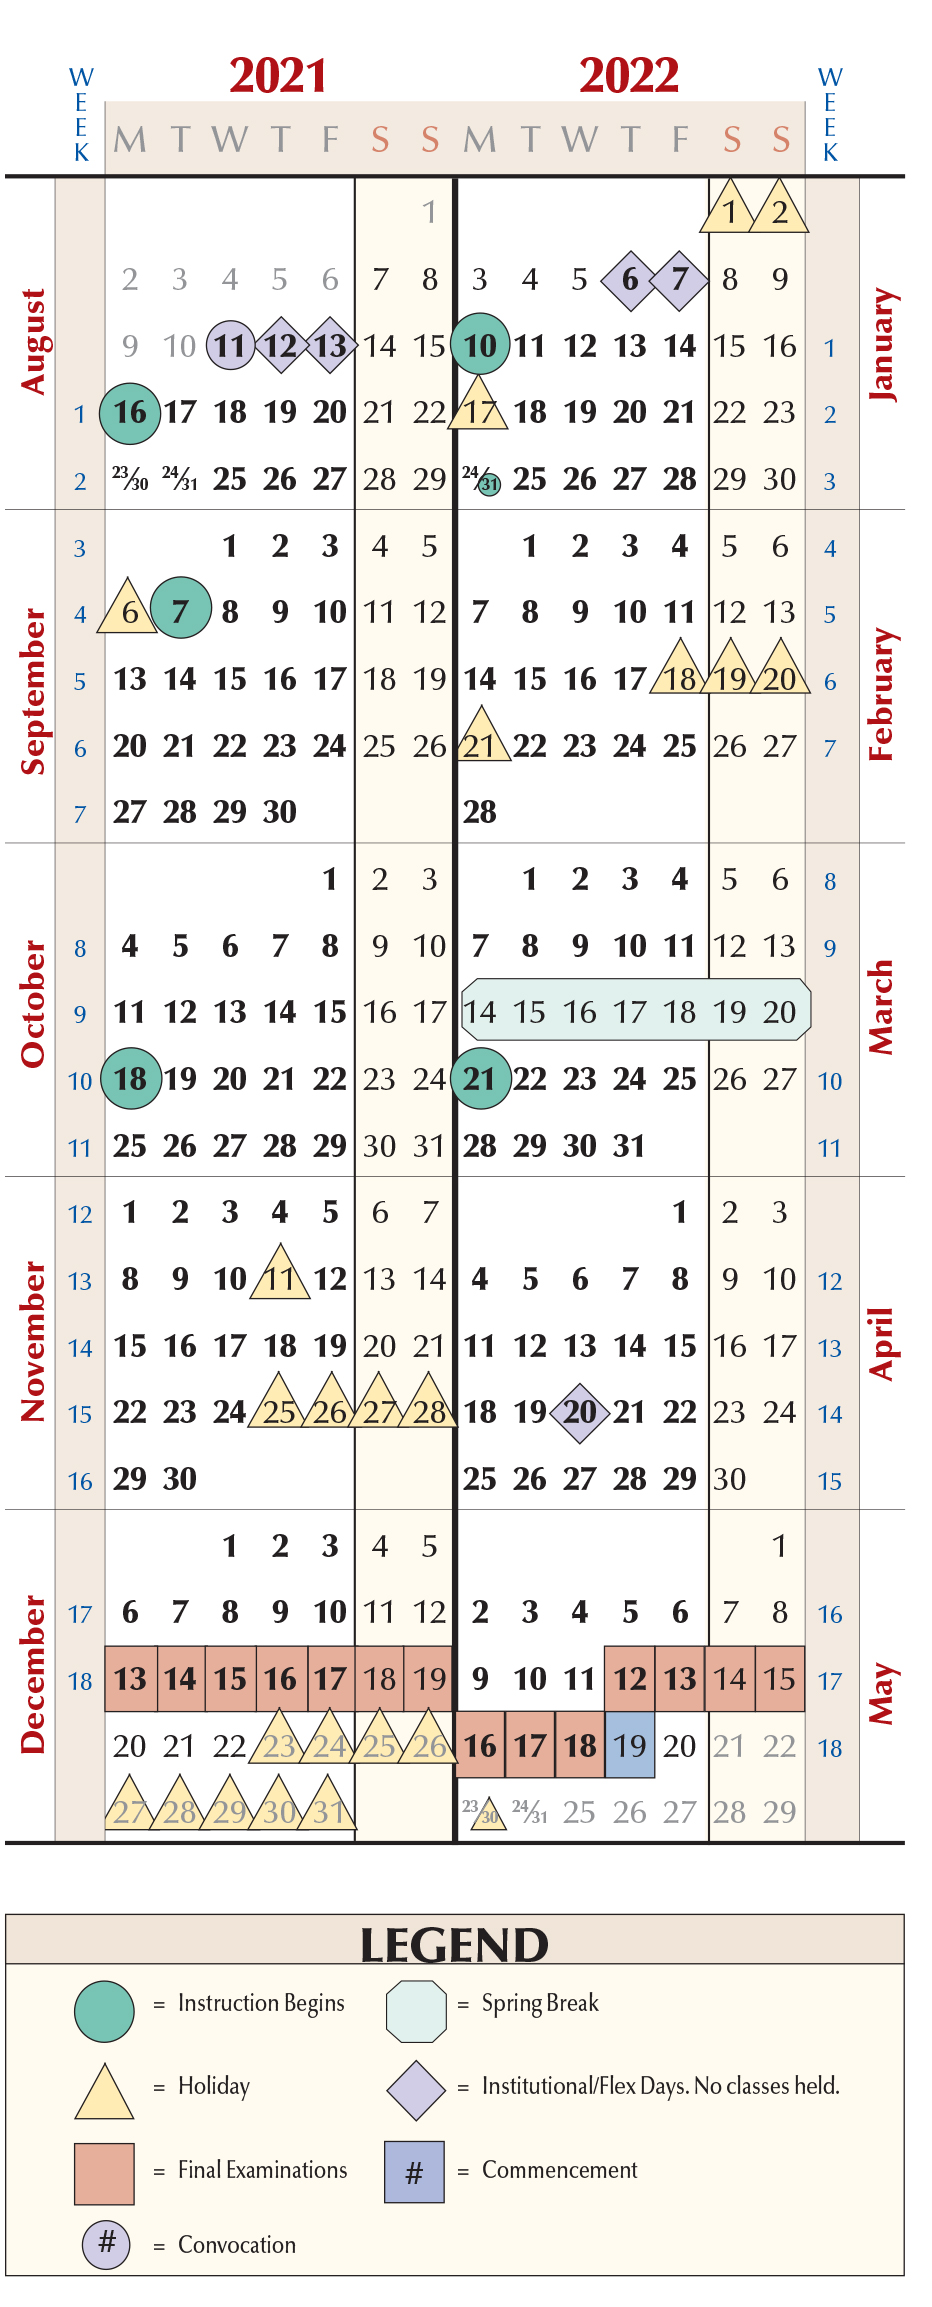 Csuf Academic Calendar Fall 2022.Fall 2021 Calendar